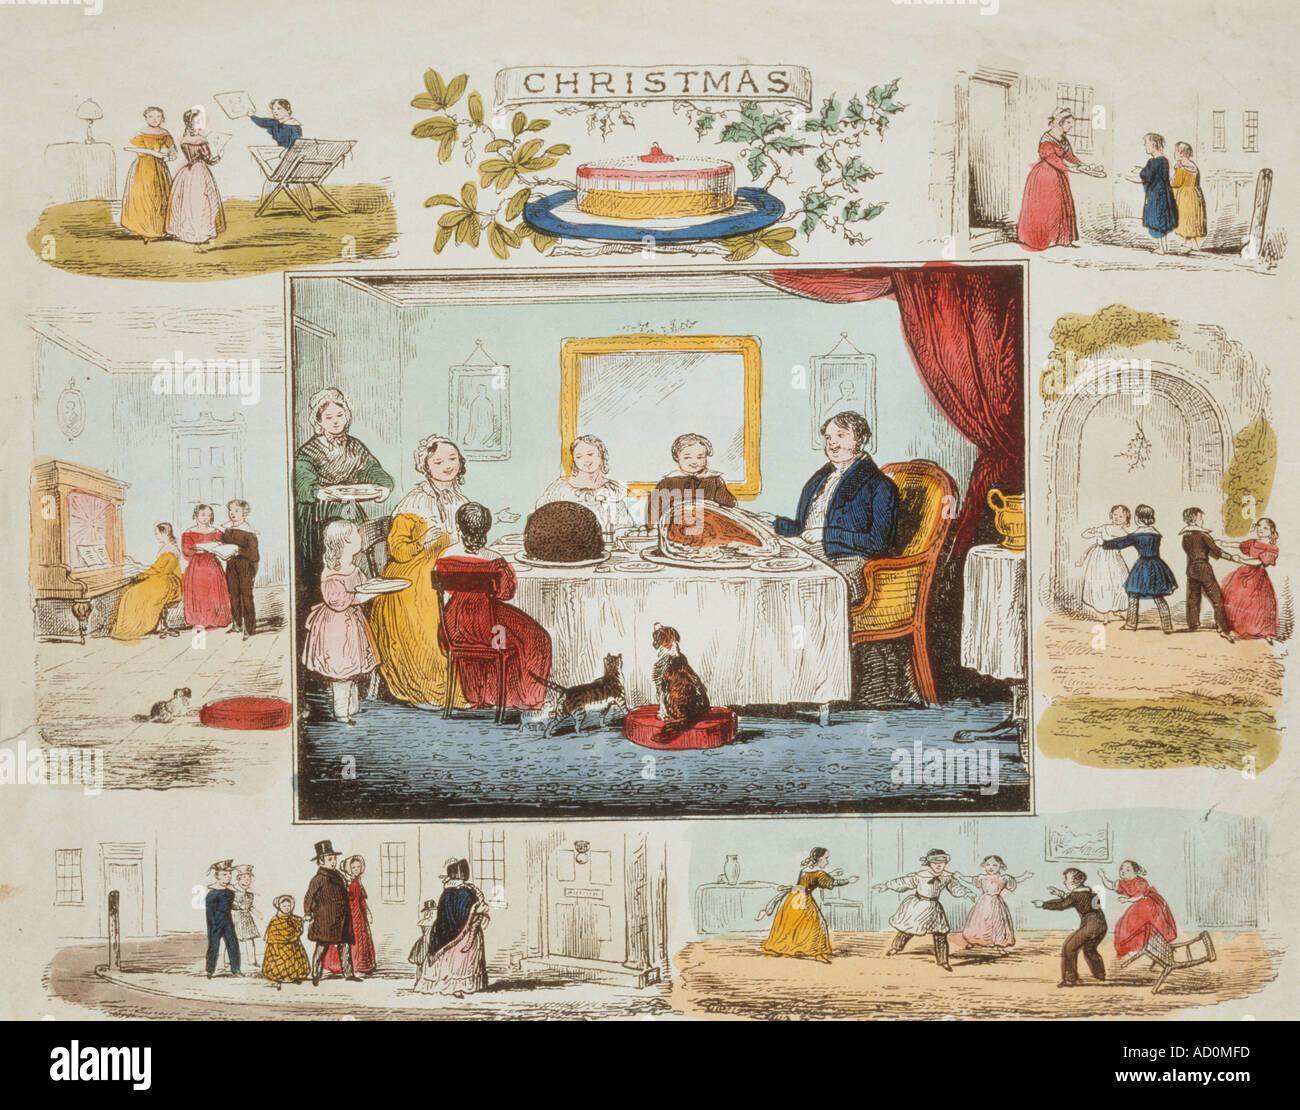 Broadsheet. Inghilterra, xix secolo. Immagini Stock